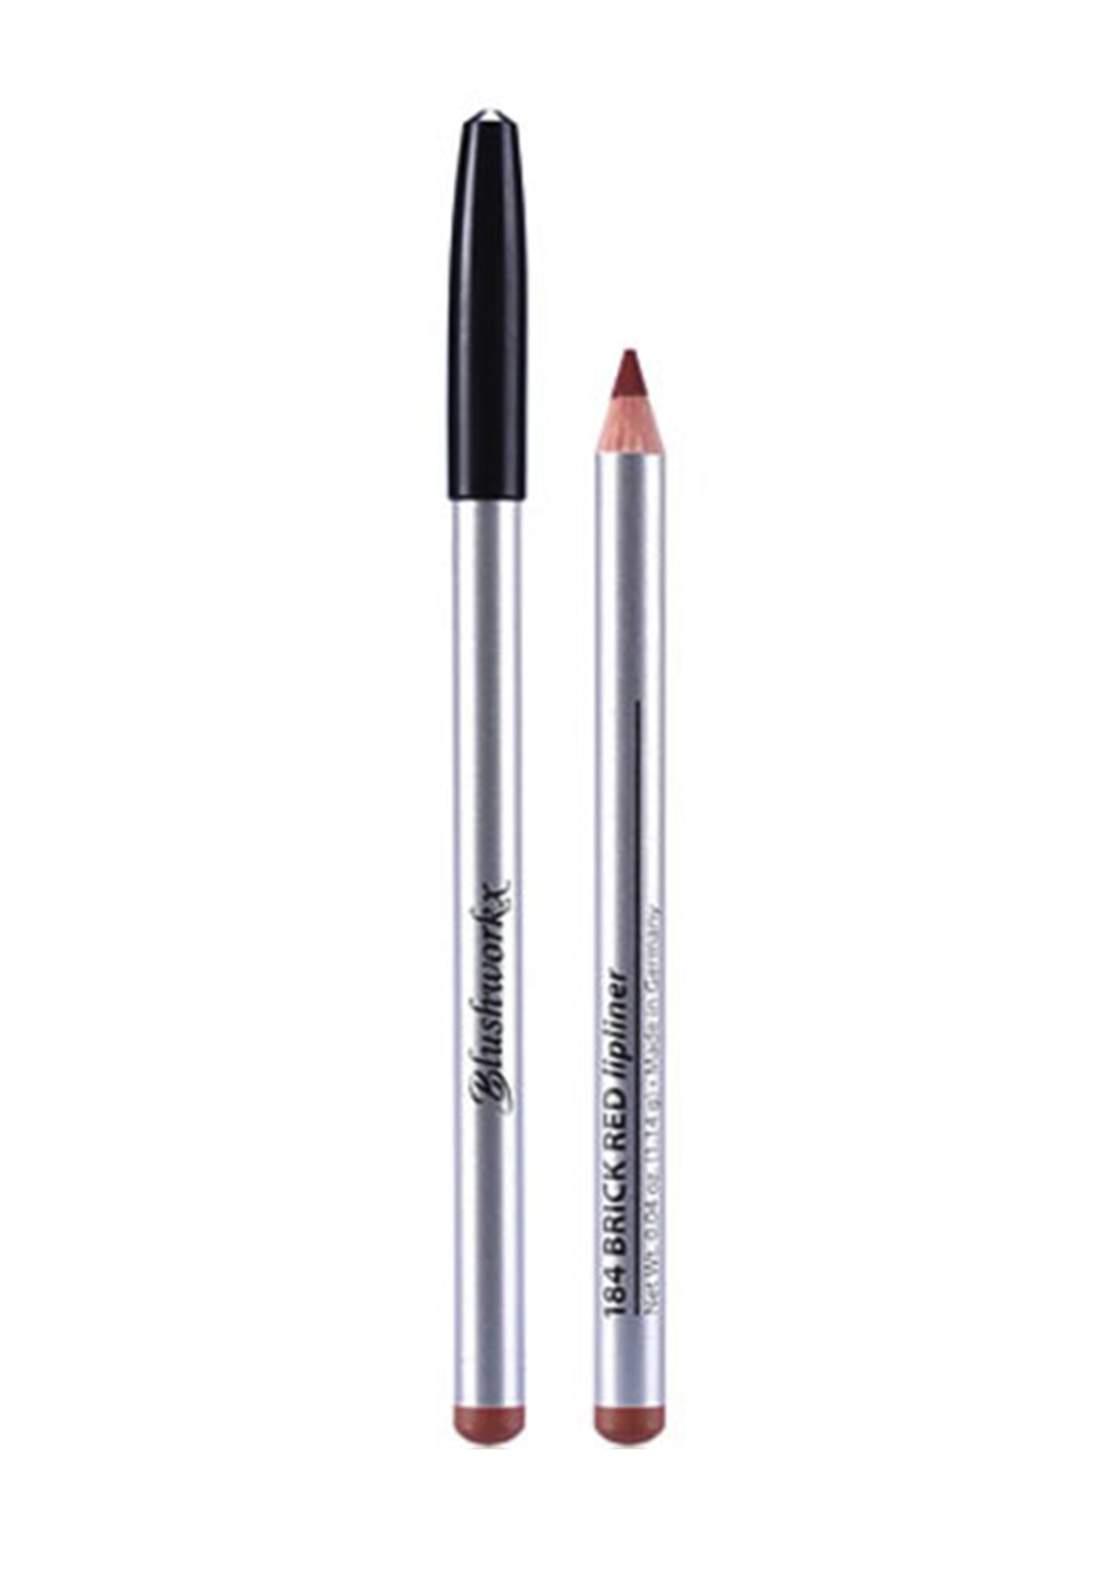 Blushworkx Hollywood Lip Liner Pencil No.185 Spiced Ginger 1.14g محدد الشفاه